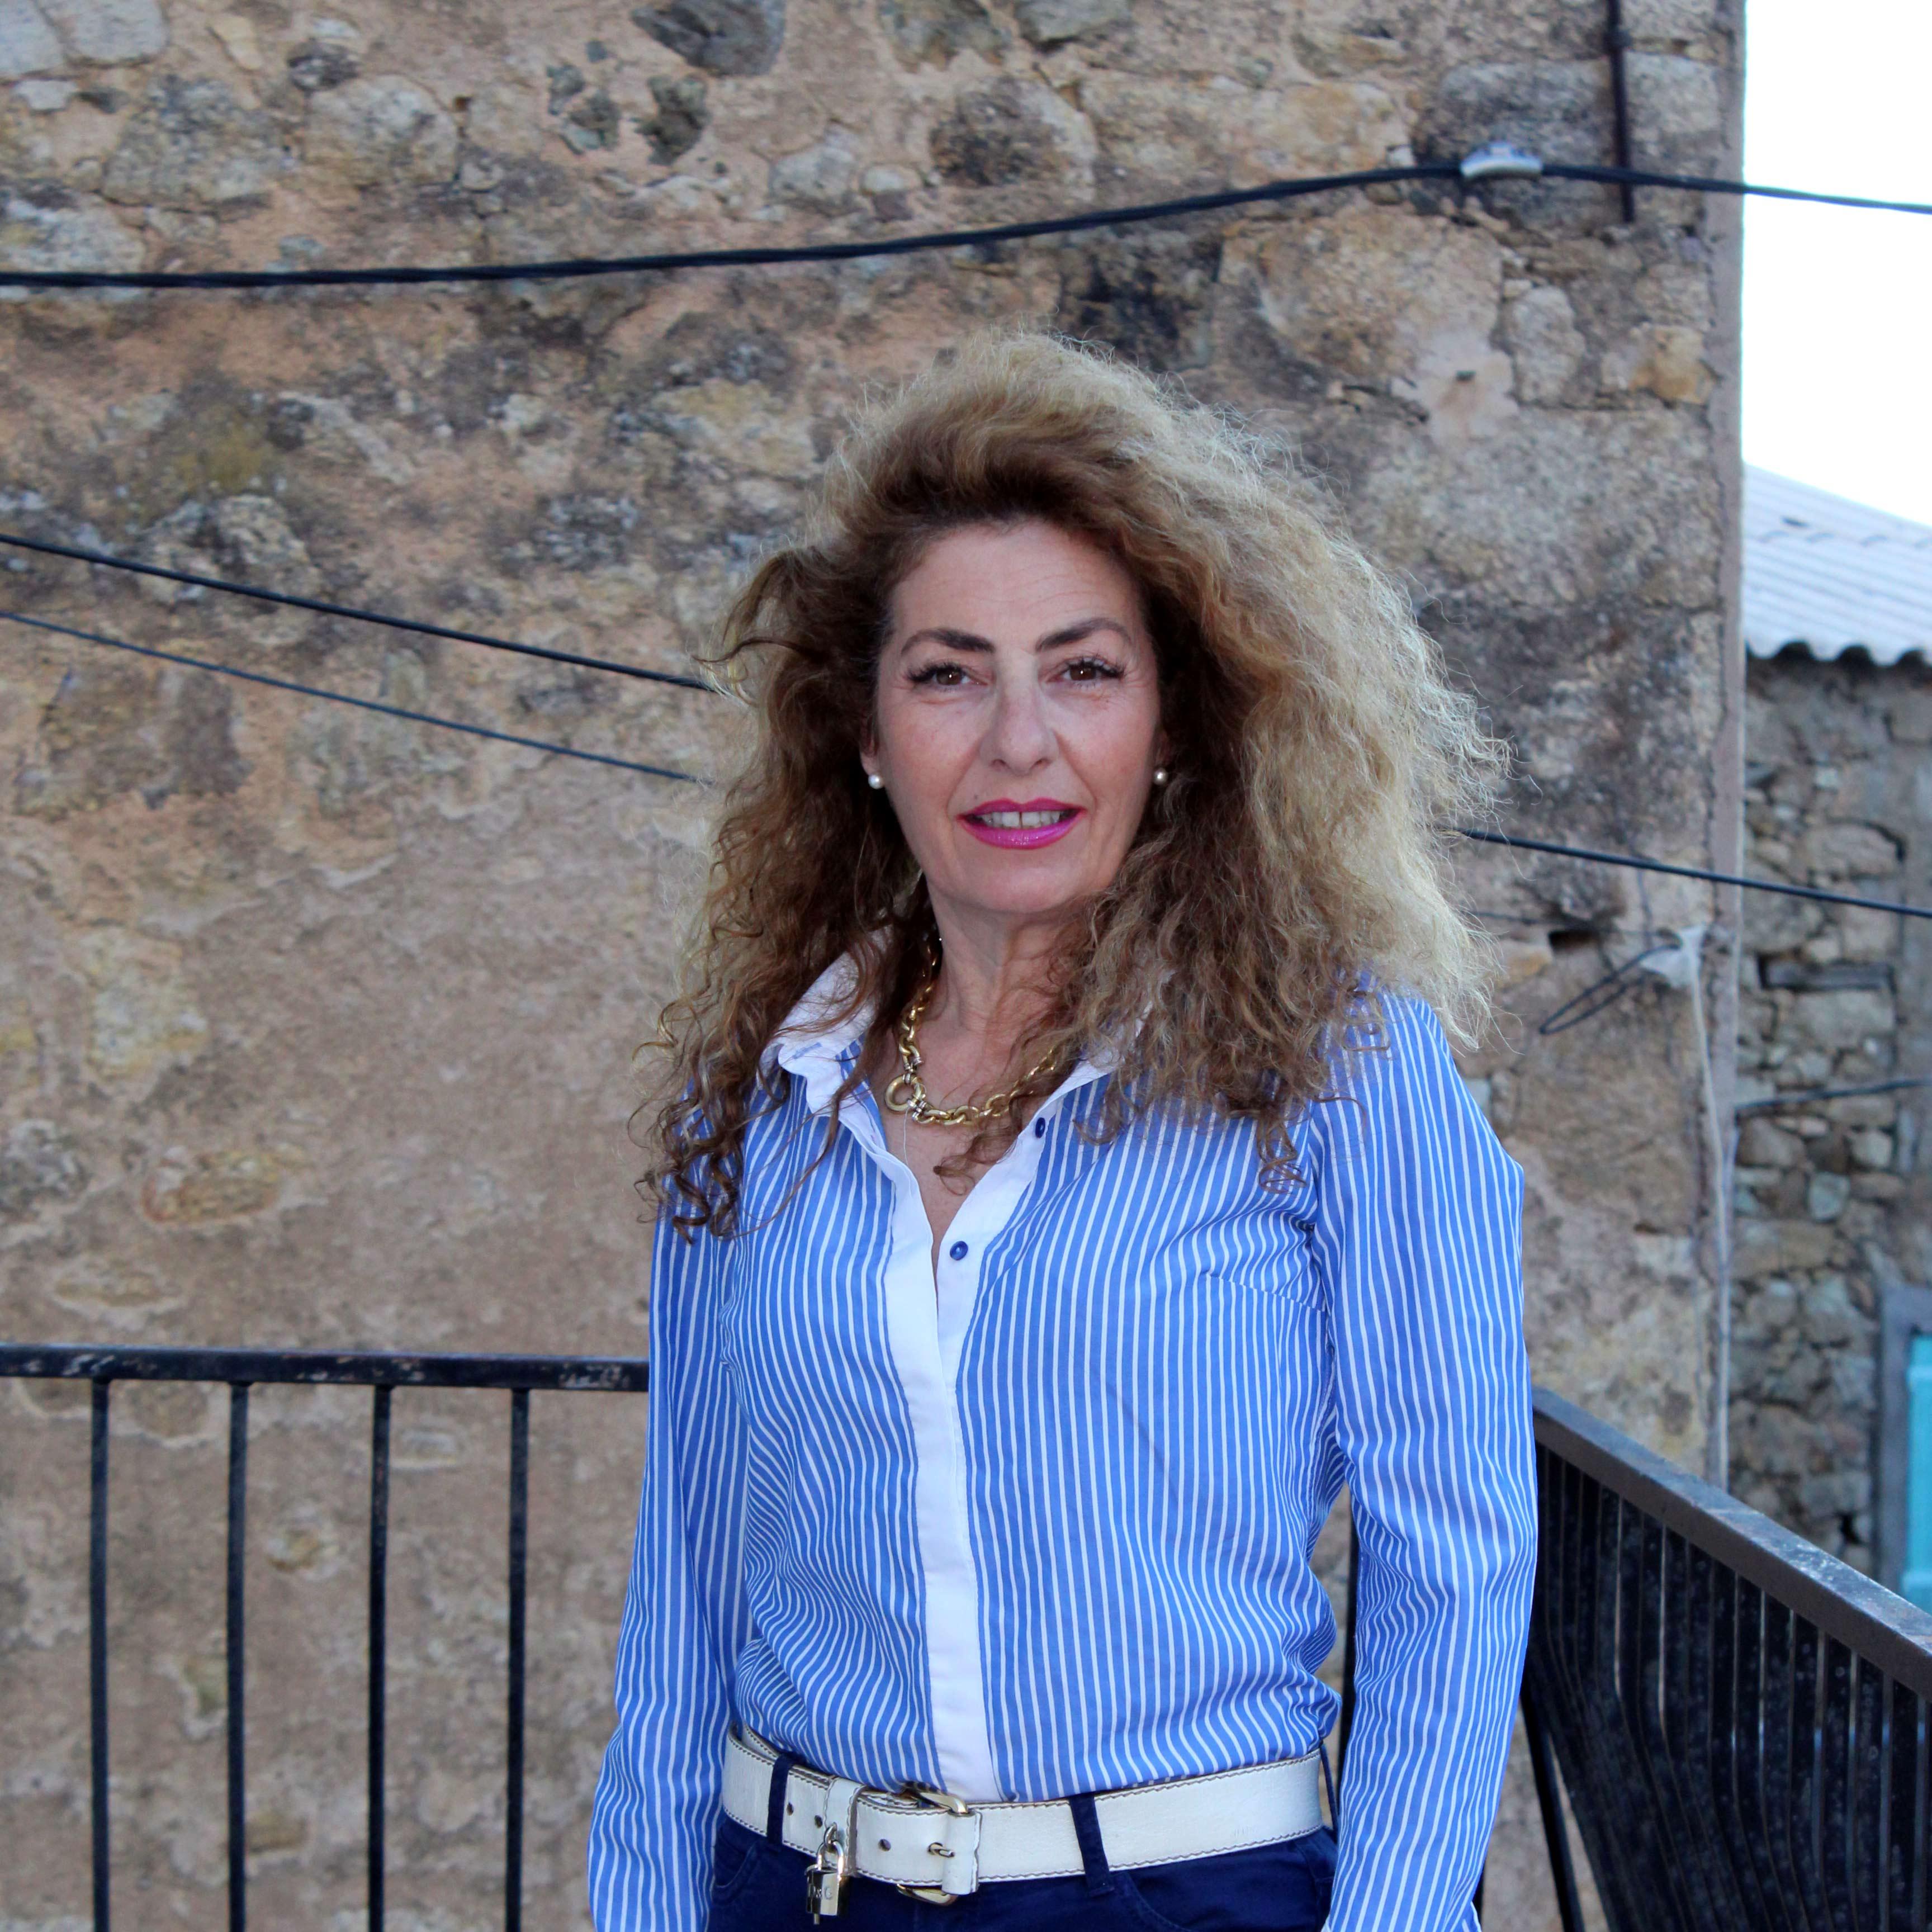 Cinq questions à Myriam Ventura, propriétaire de la Casa Theodora